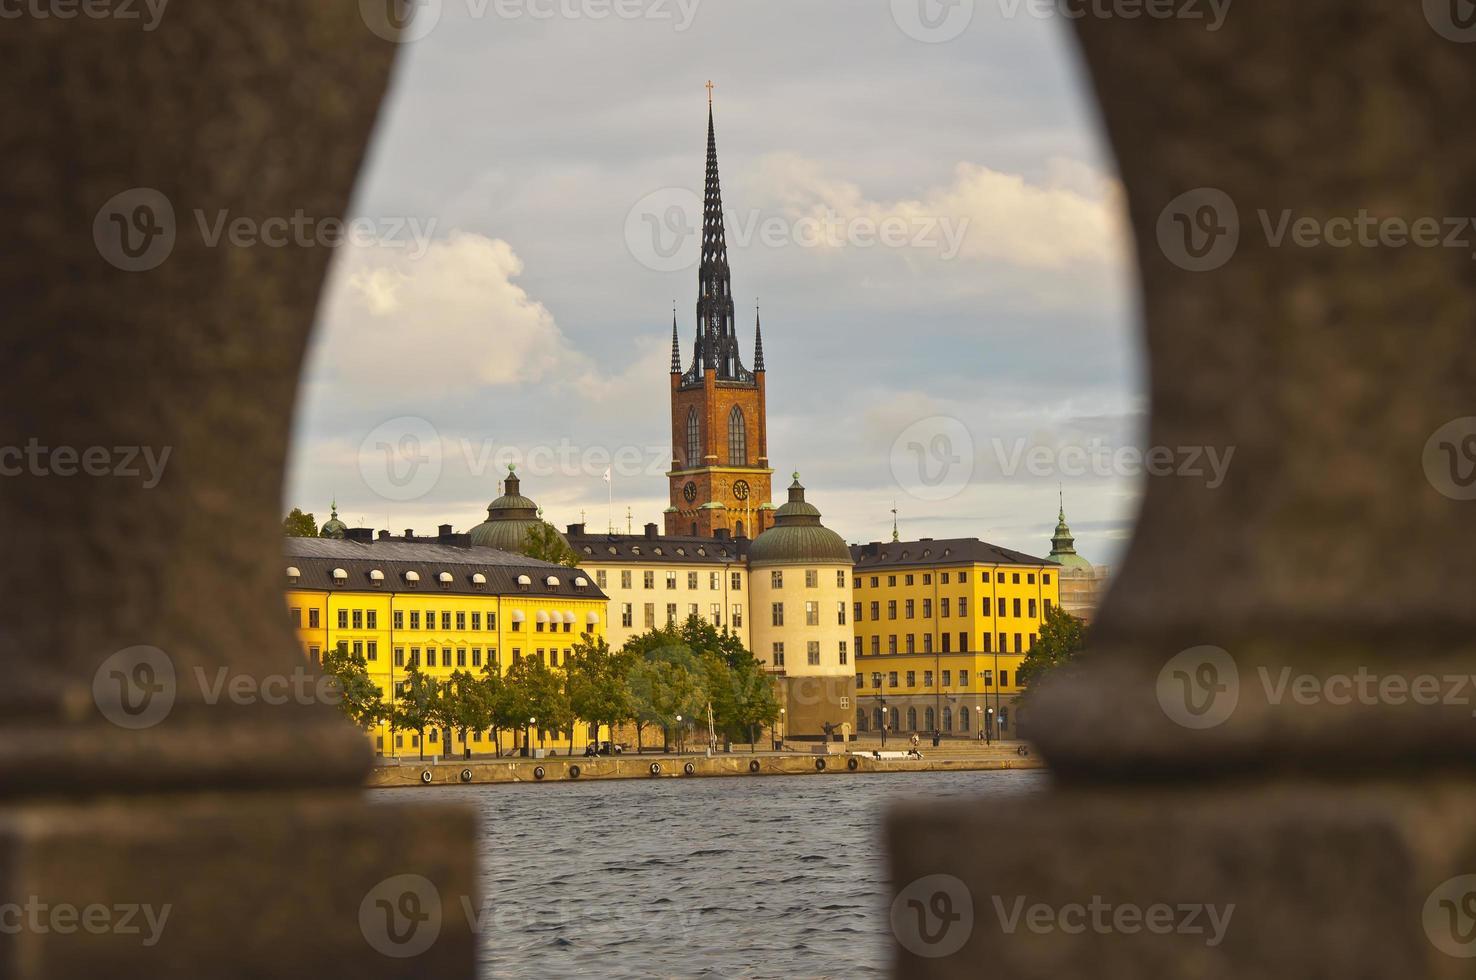 kathedraal uitzicht, stockholm, Zweden foto